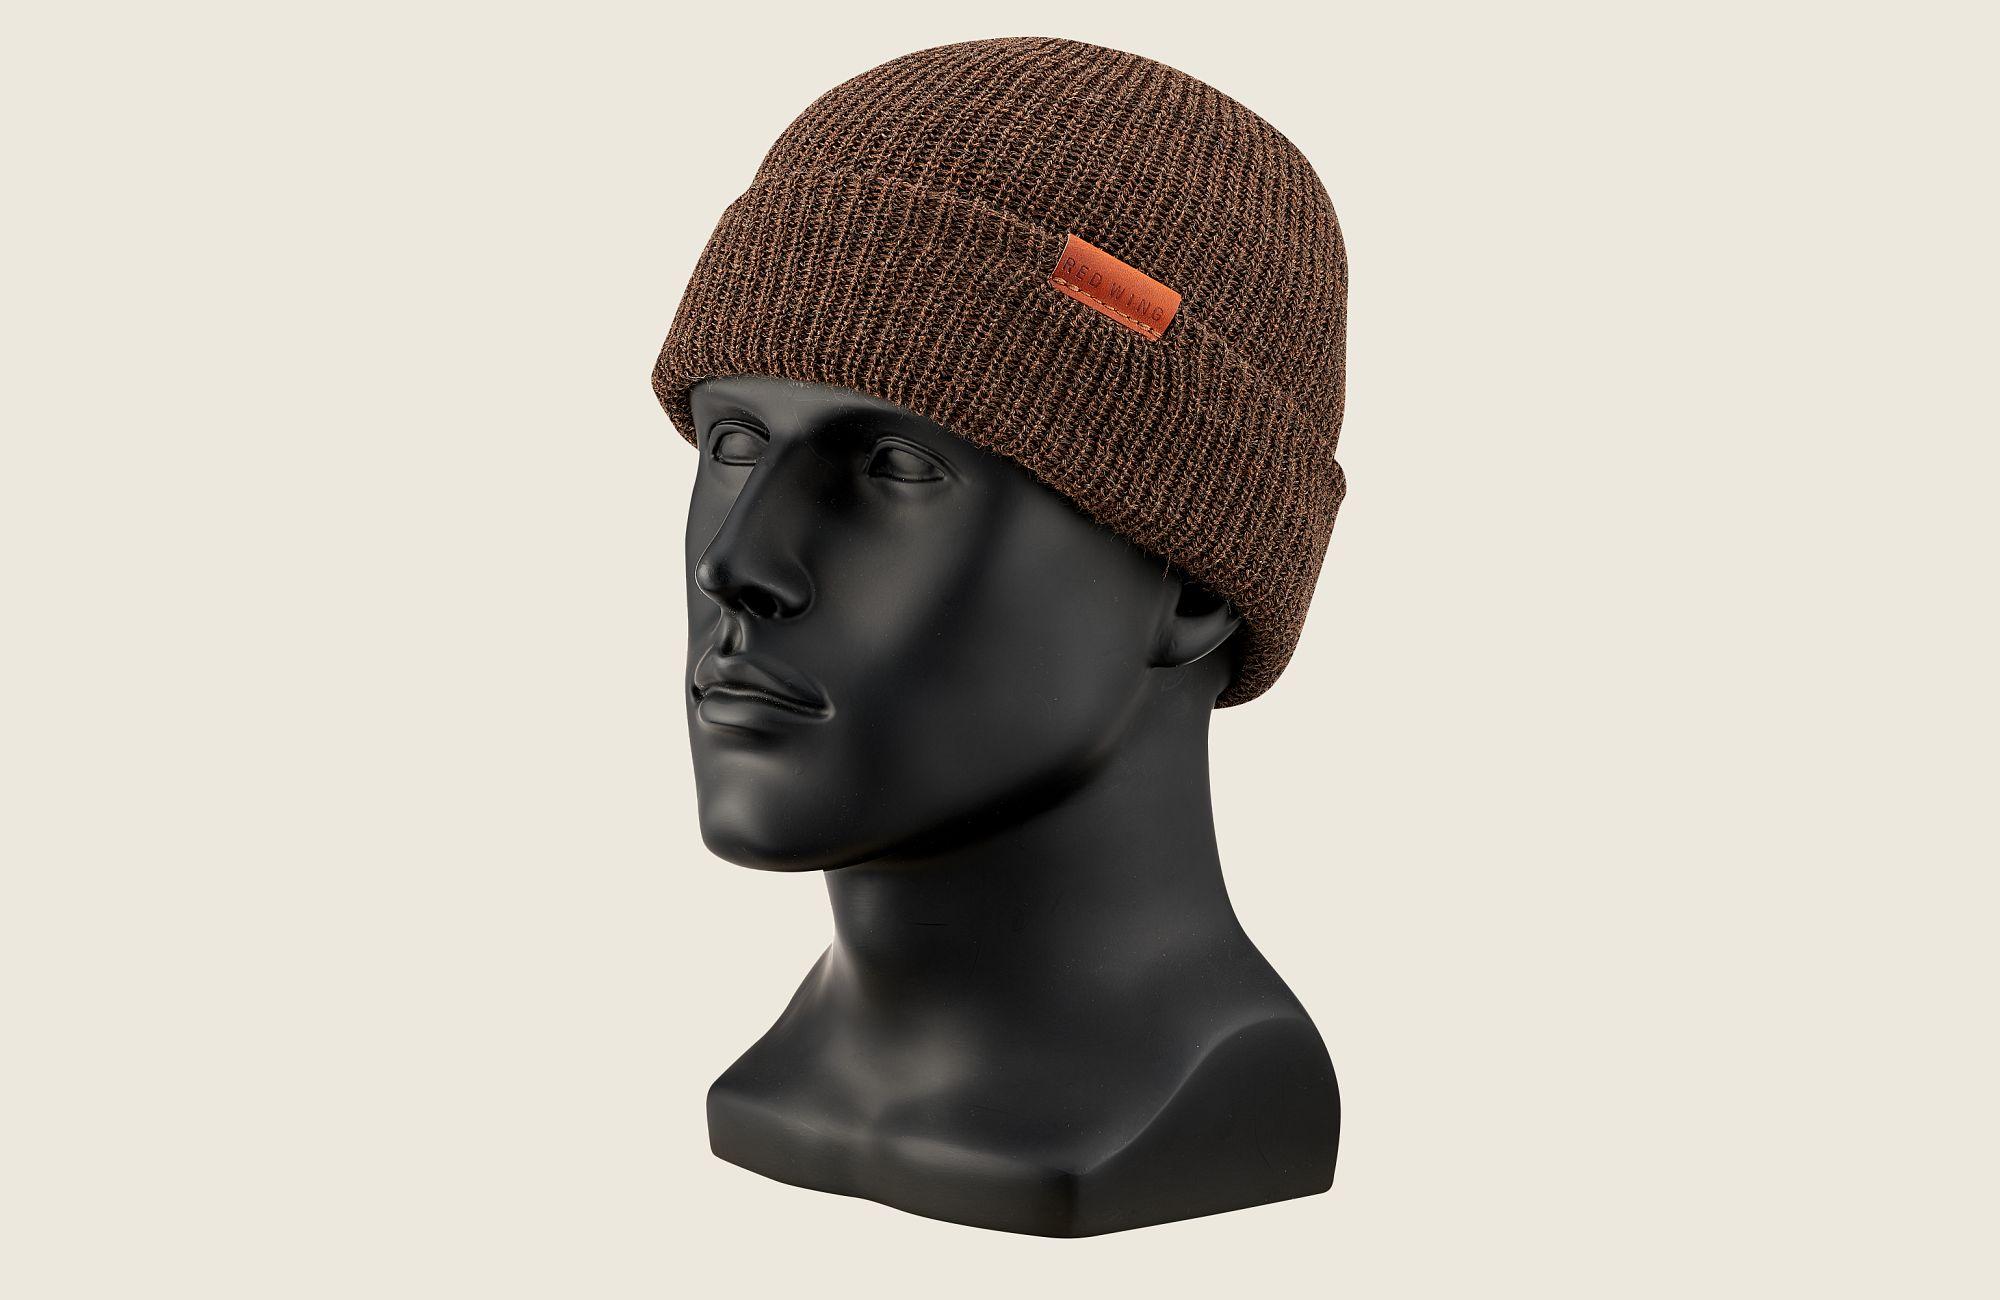 CAP, BROWN HEATHER WOOL KNIT image number 0